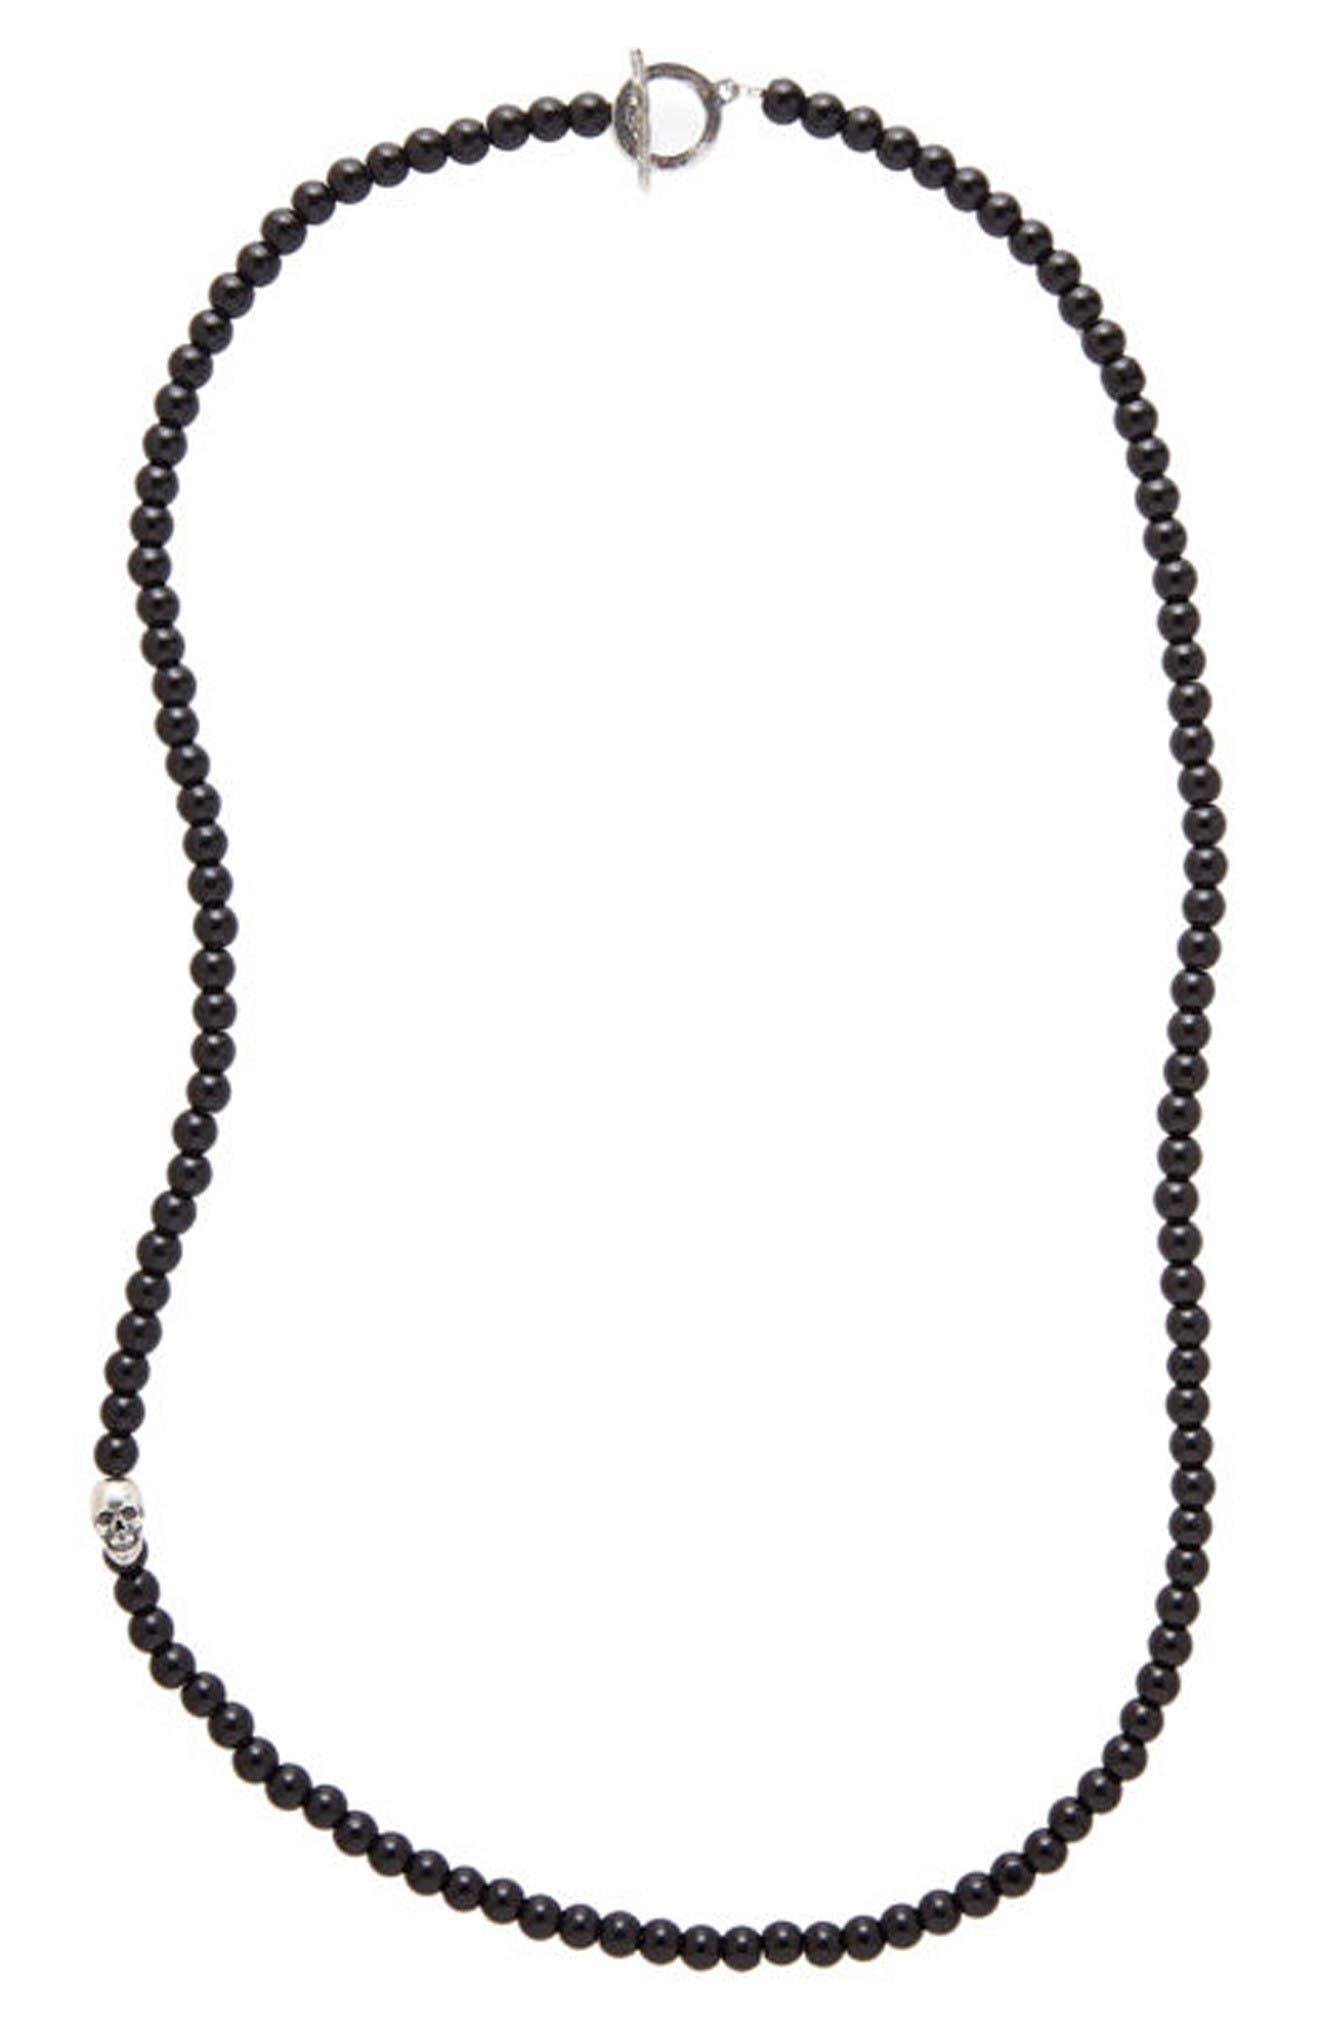 Main Image - Degs & Sal Onyx Bead Necklace